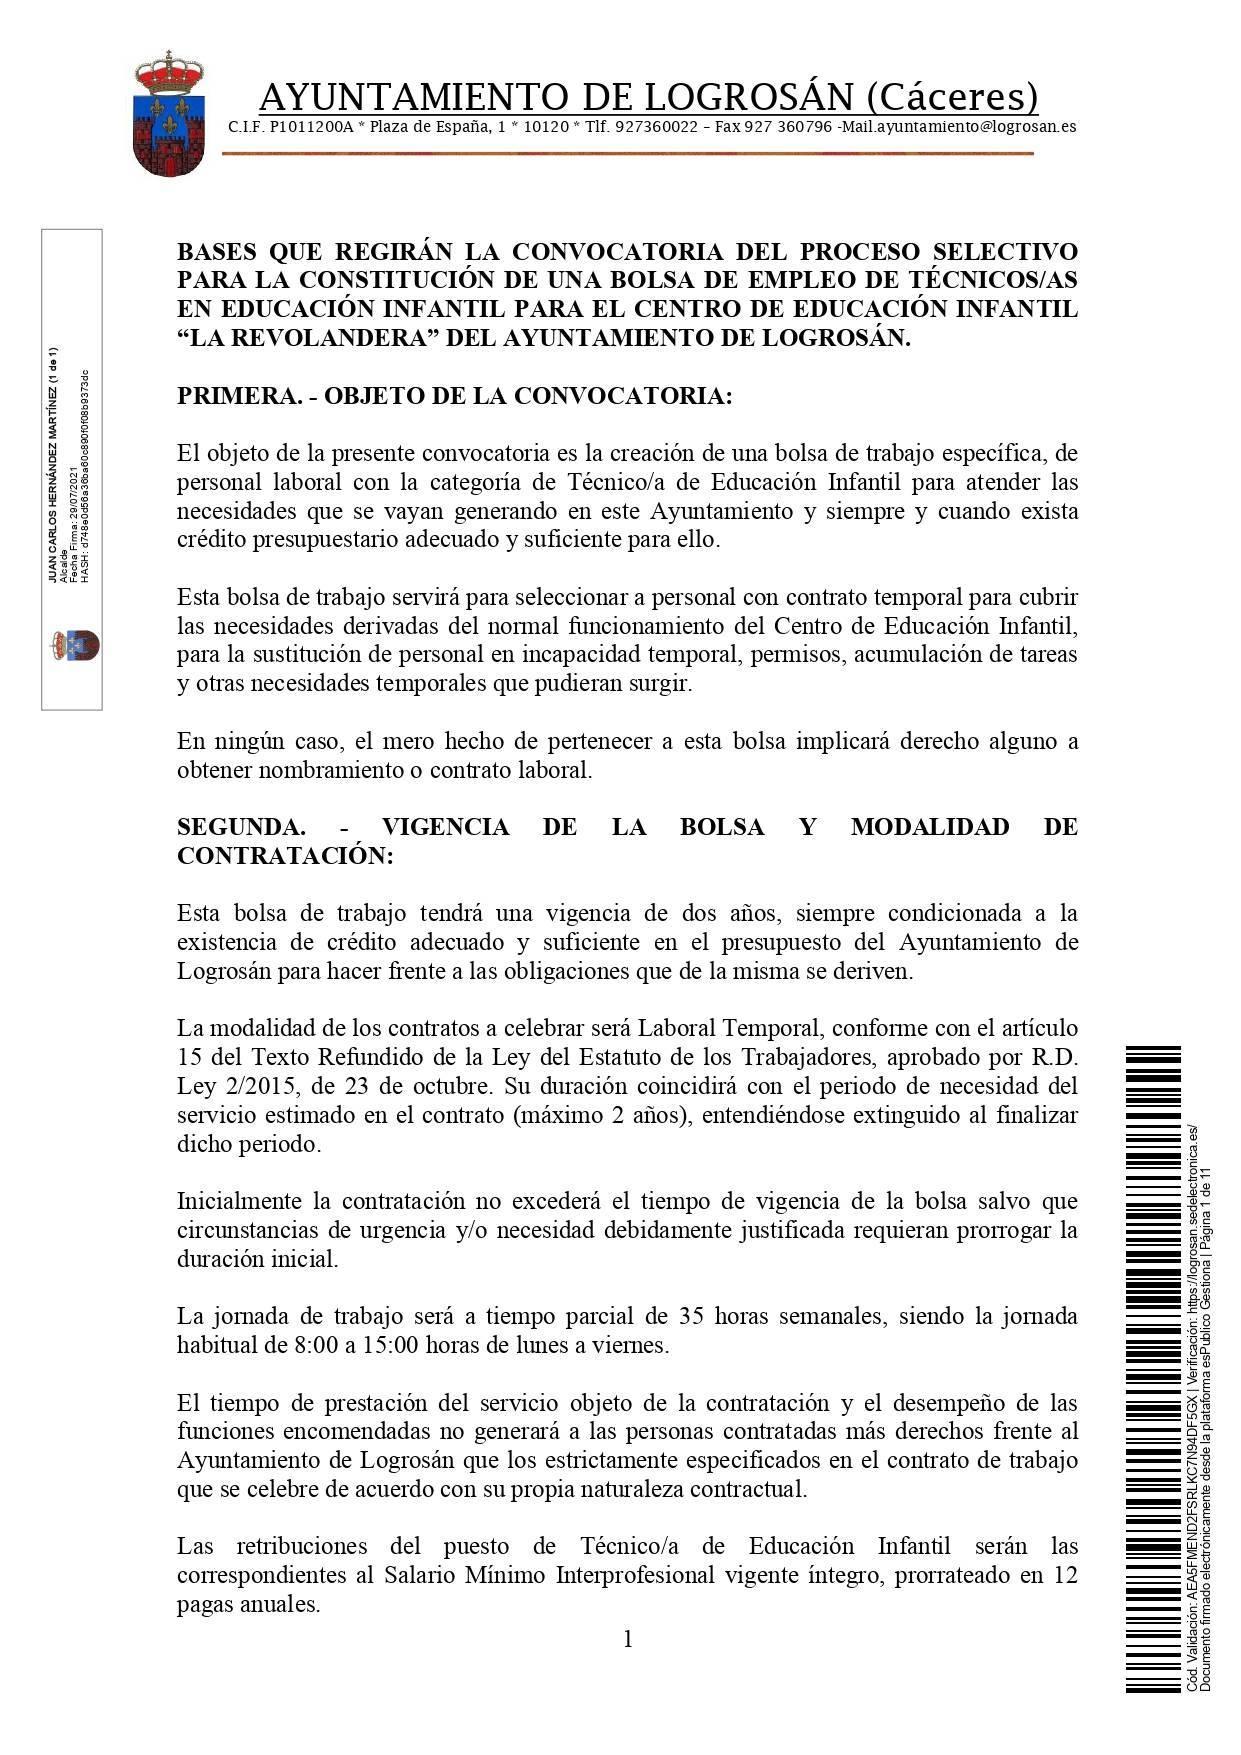 Bolsa de técnicos-as en educación infantil (2021) - Logrosán (Cáceres) 1